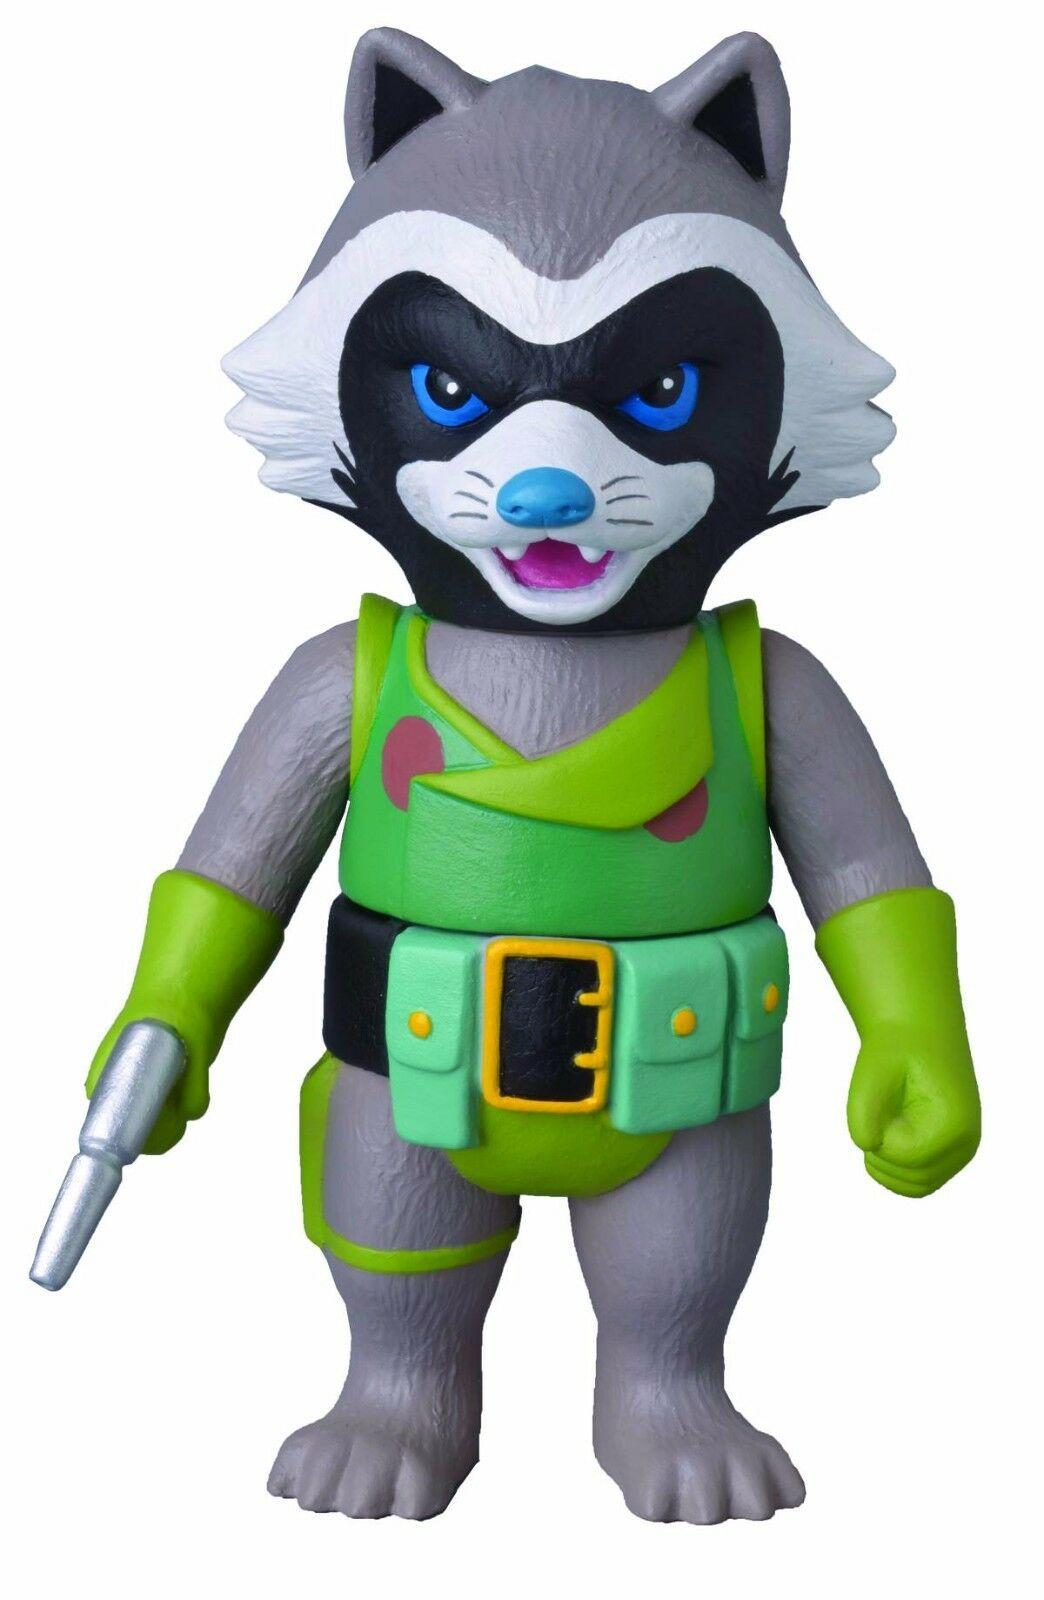 Medicom Marvel Hero Sofubi Retro Rocket Racoon Previews Exclusive Action Figure 4530956531694